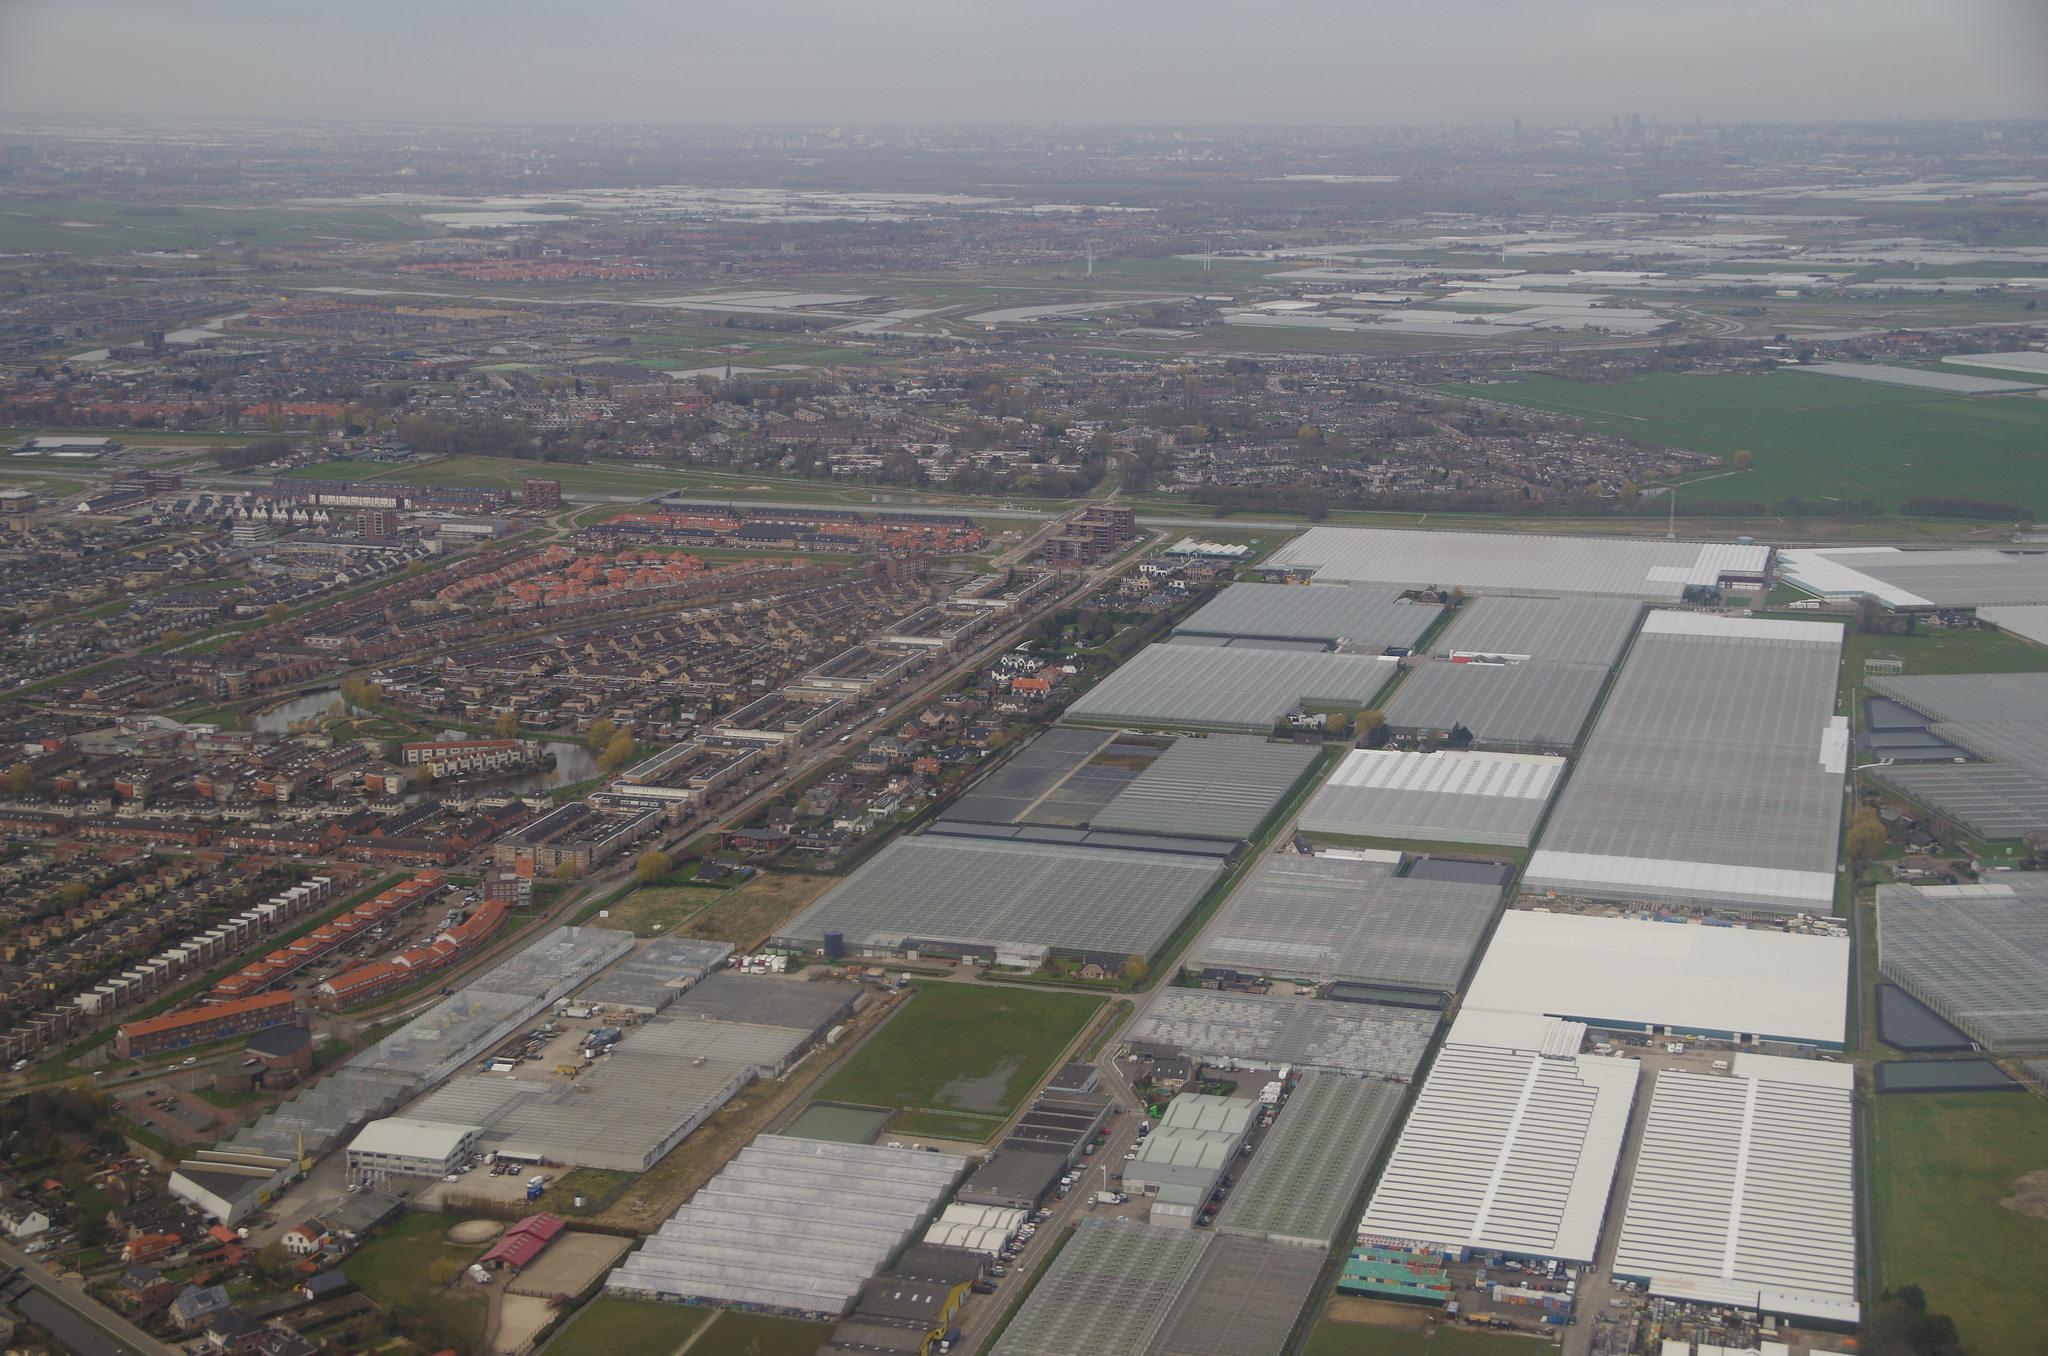 Greenhouses in the Netherlands. Photo: Pieter Edelman